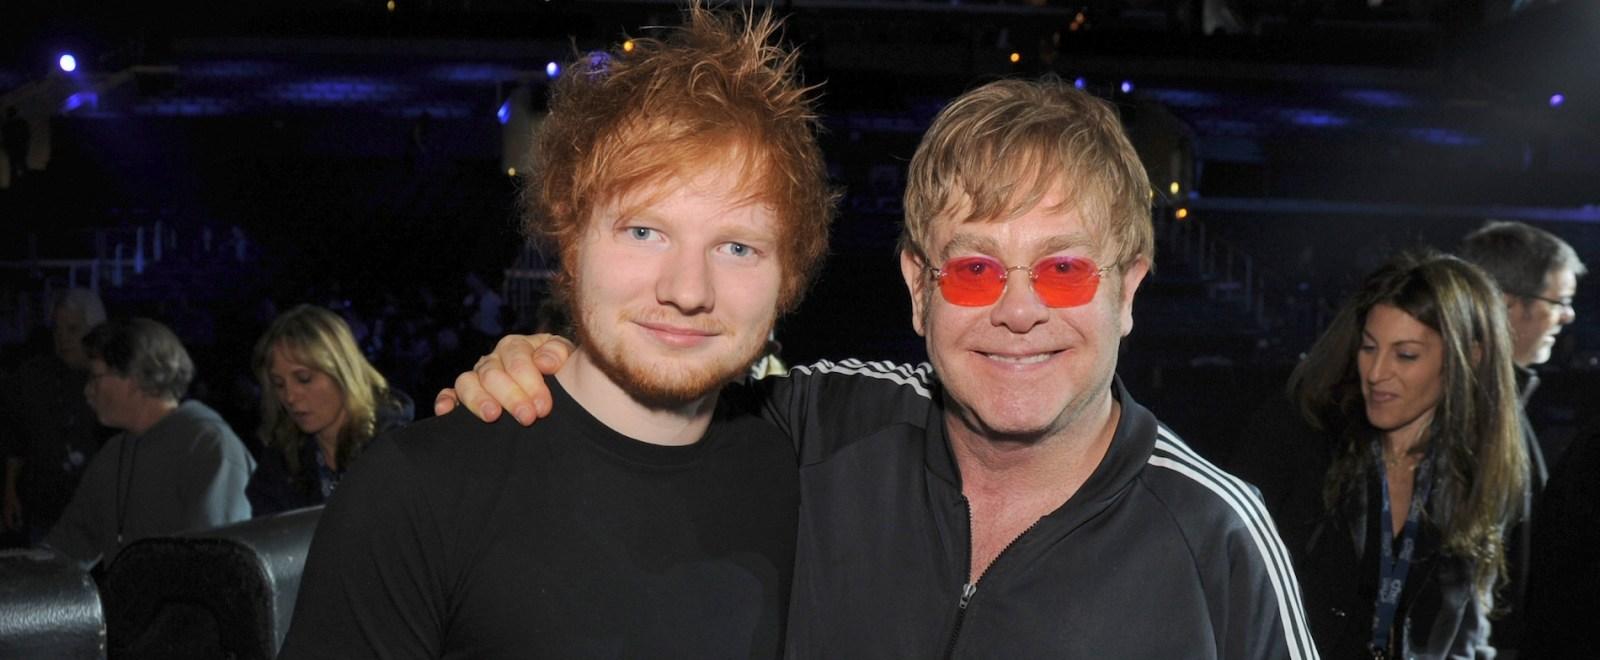 Ed Sheeran, Elton John, Brandi Carlile, And Courteney Cox Honor Lisa Kudrow With 'Tiny Dancer'